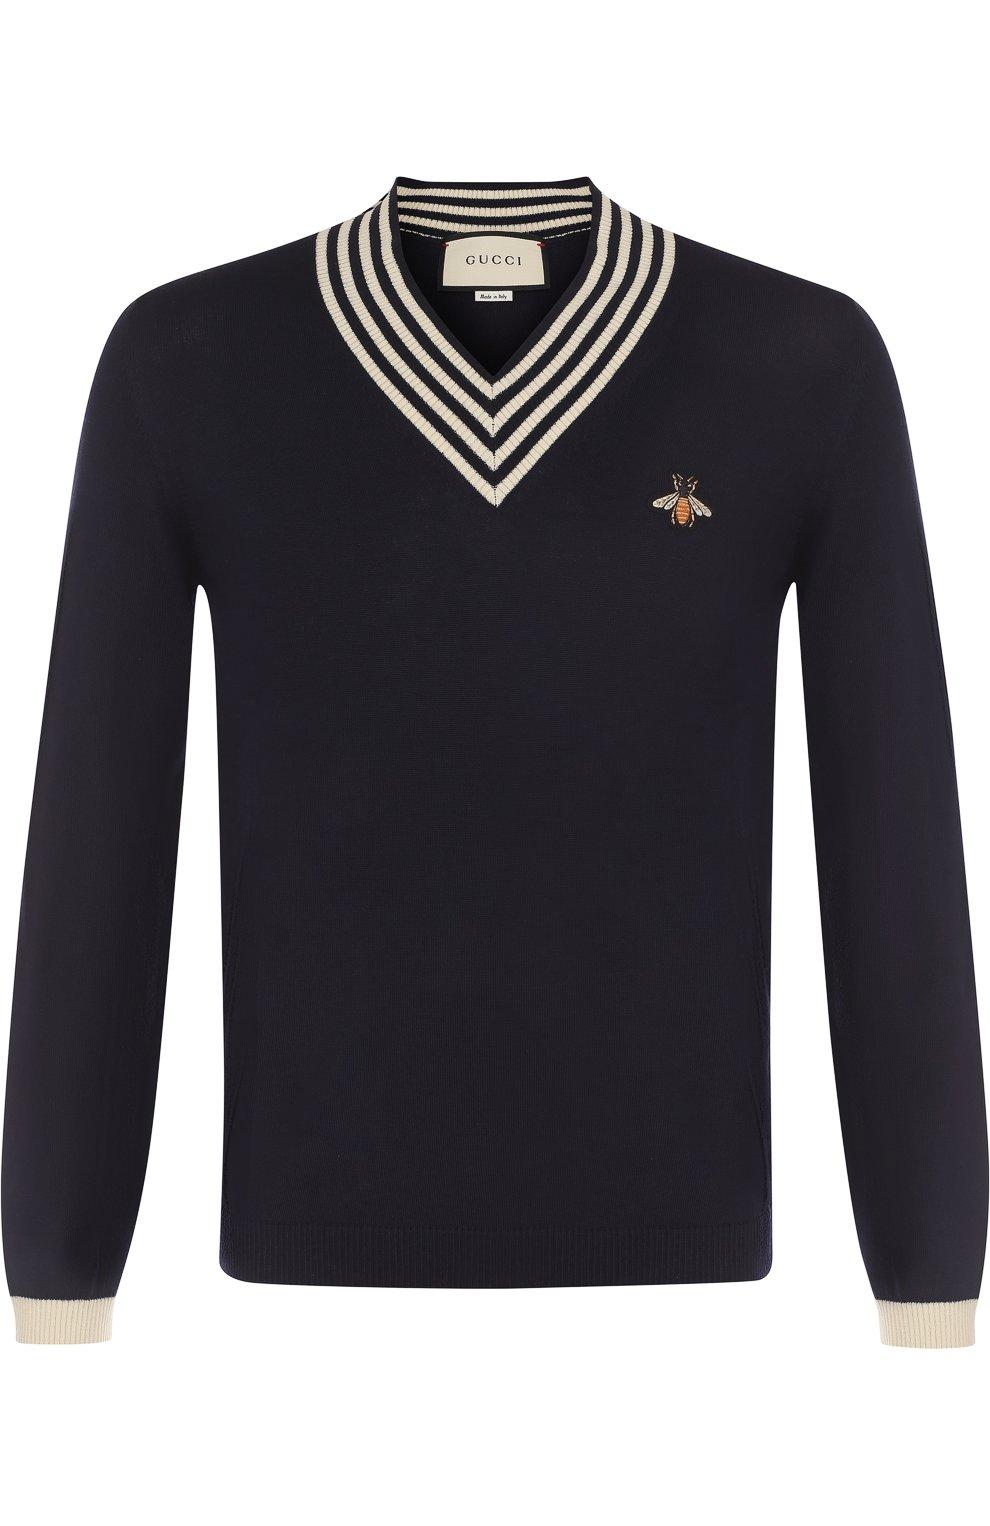 1e7e08064db Мужская одежда Gucci по цене от 26 950 руб. купить в интернет-магазине ЦУМ